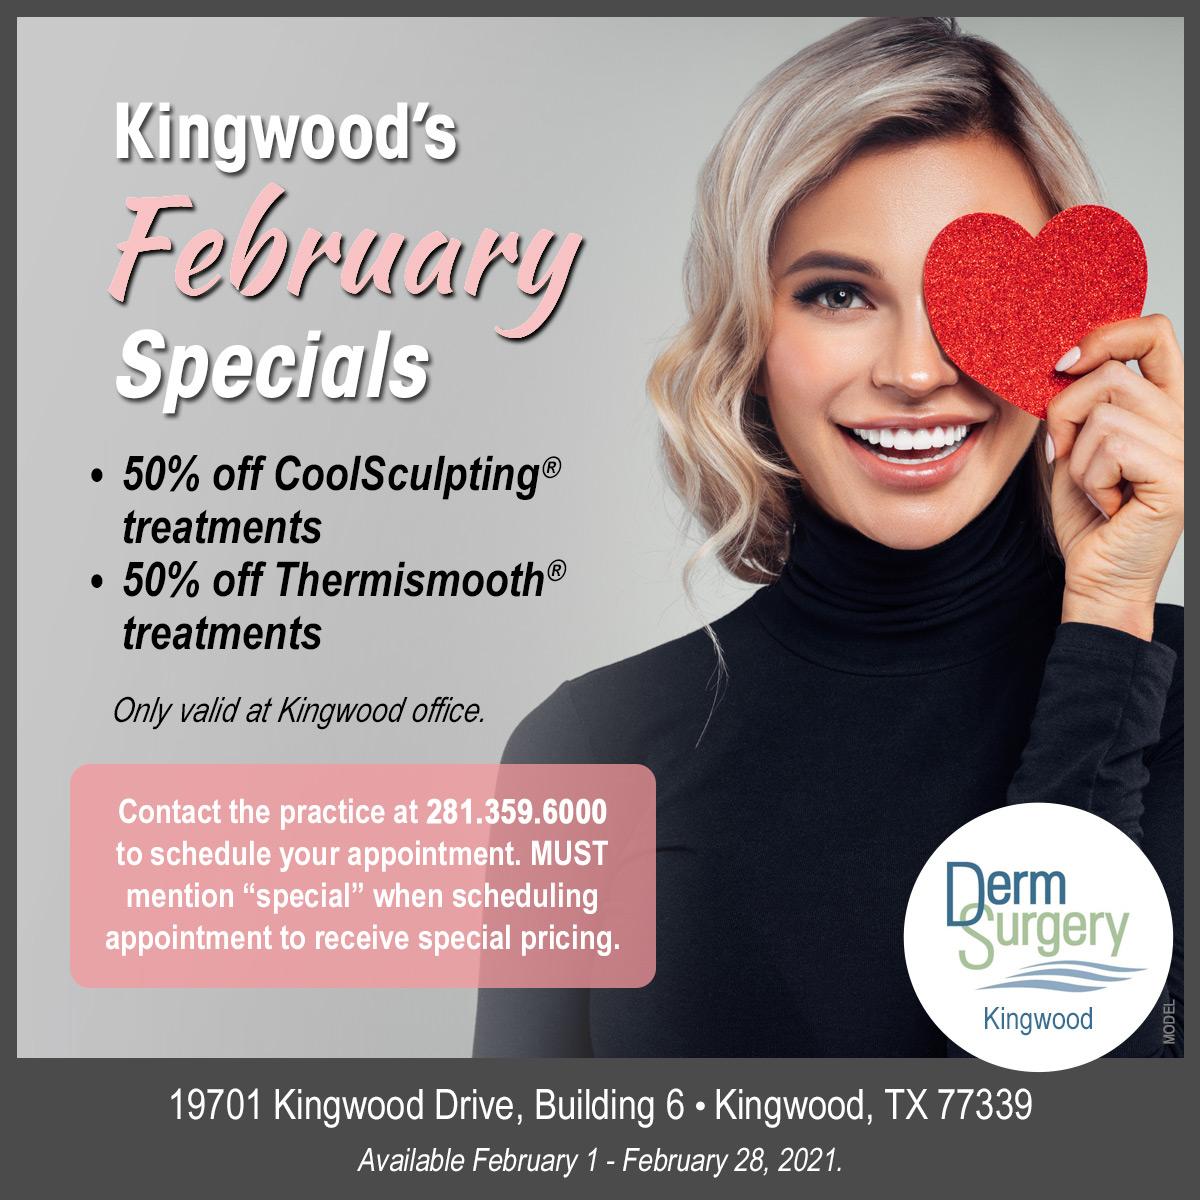 Kingwood Spa'sFebruary Special